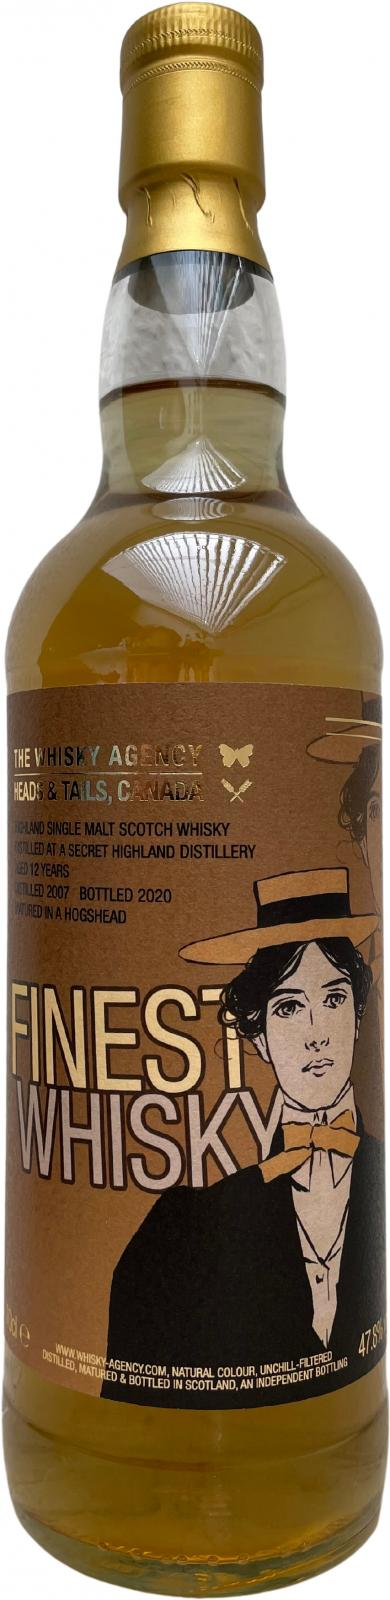 Secret Highland Distillery 2007 TWA